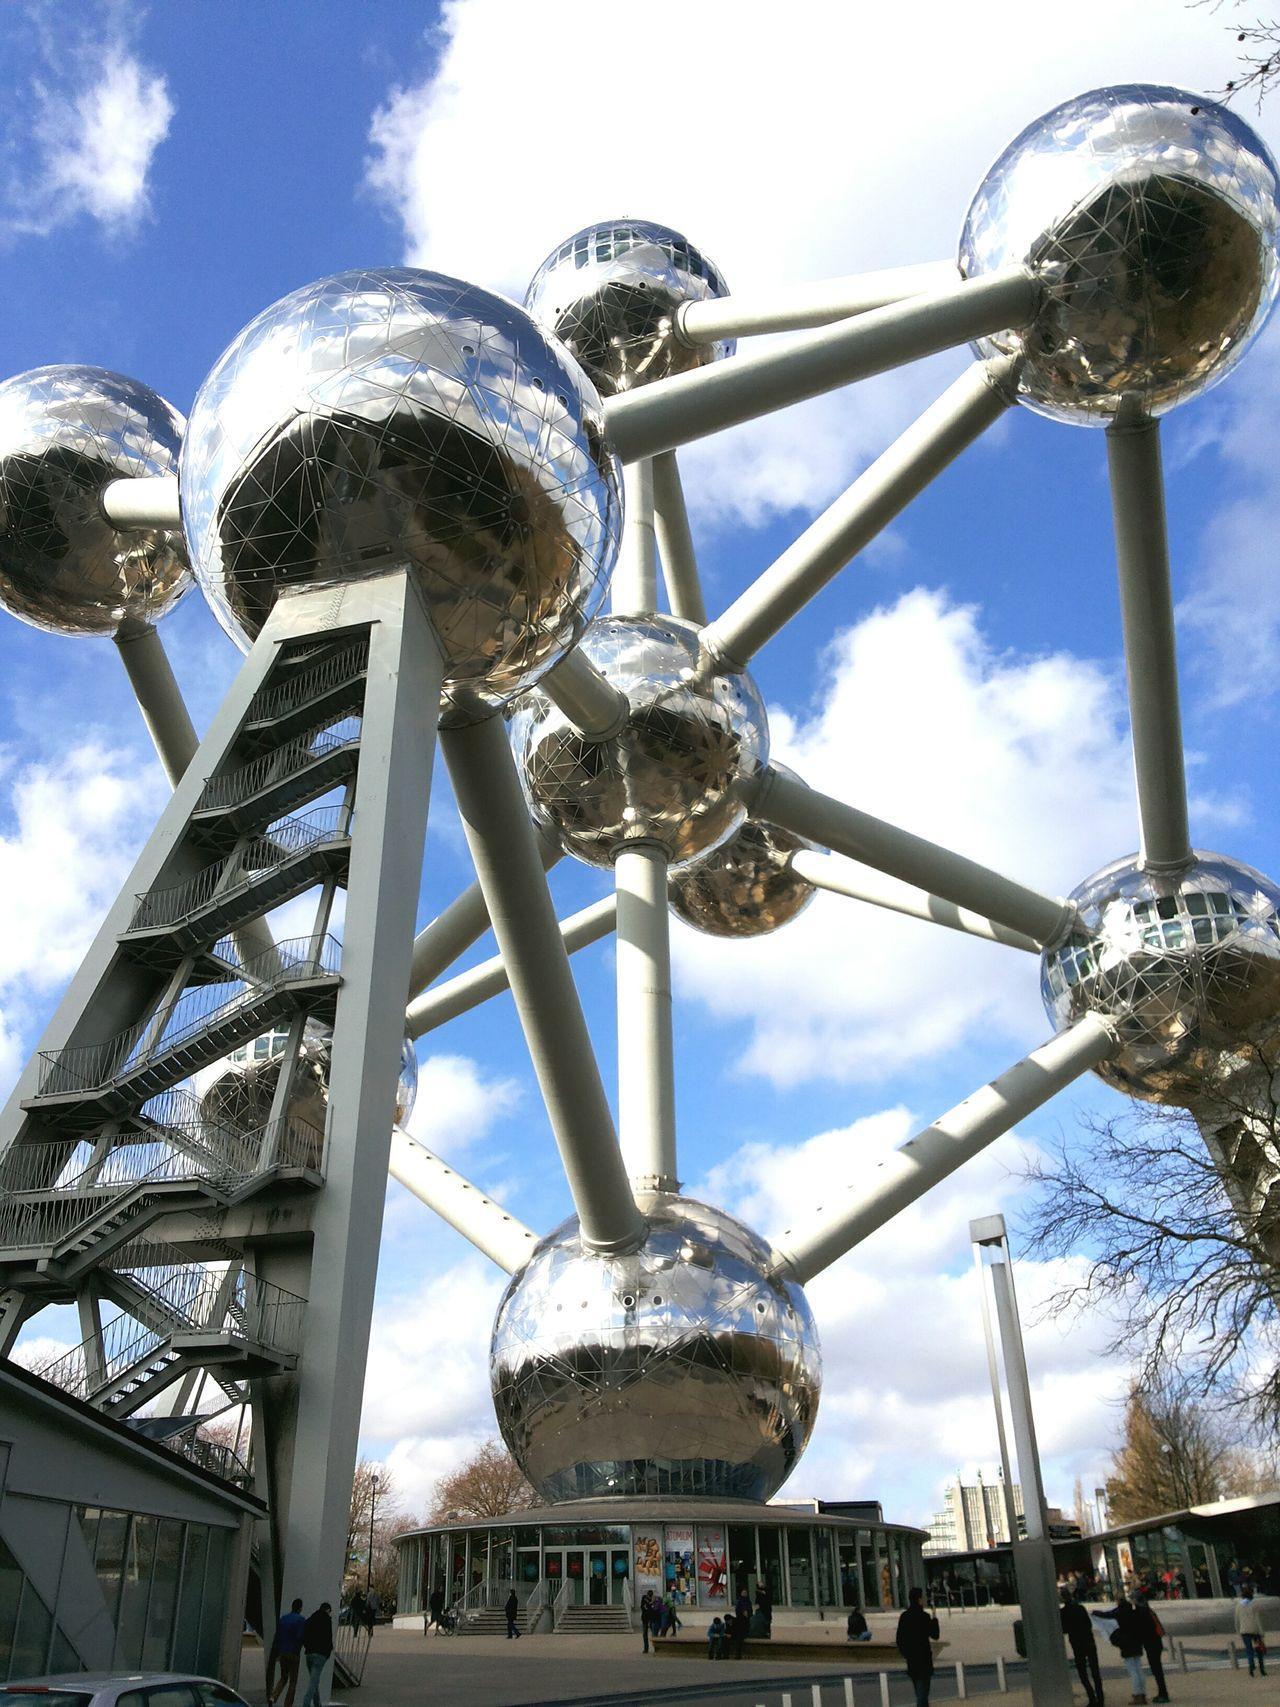 Built Structure Travel Destinations Vacation Destination Europe Belgium Brussels Brussels Architecture Atomium Atomiumbrussels